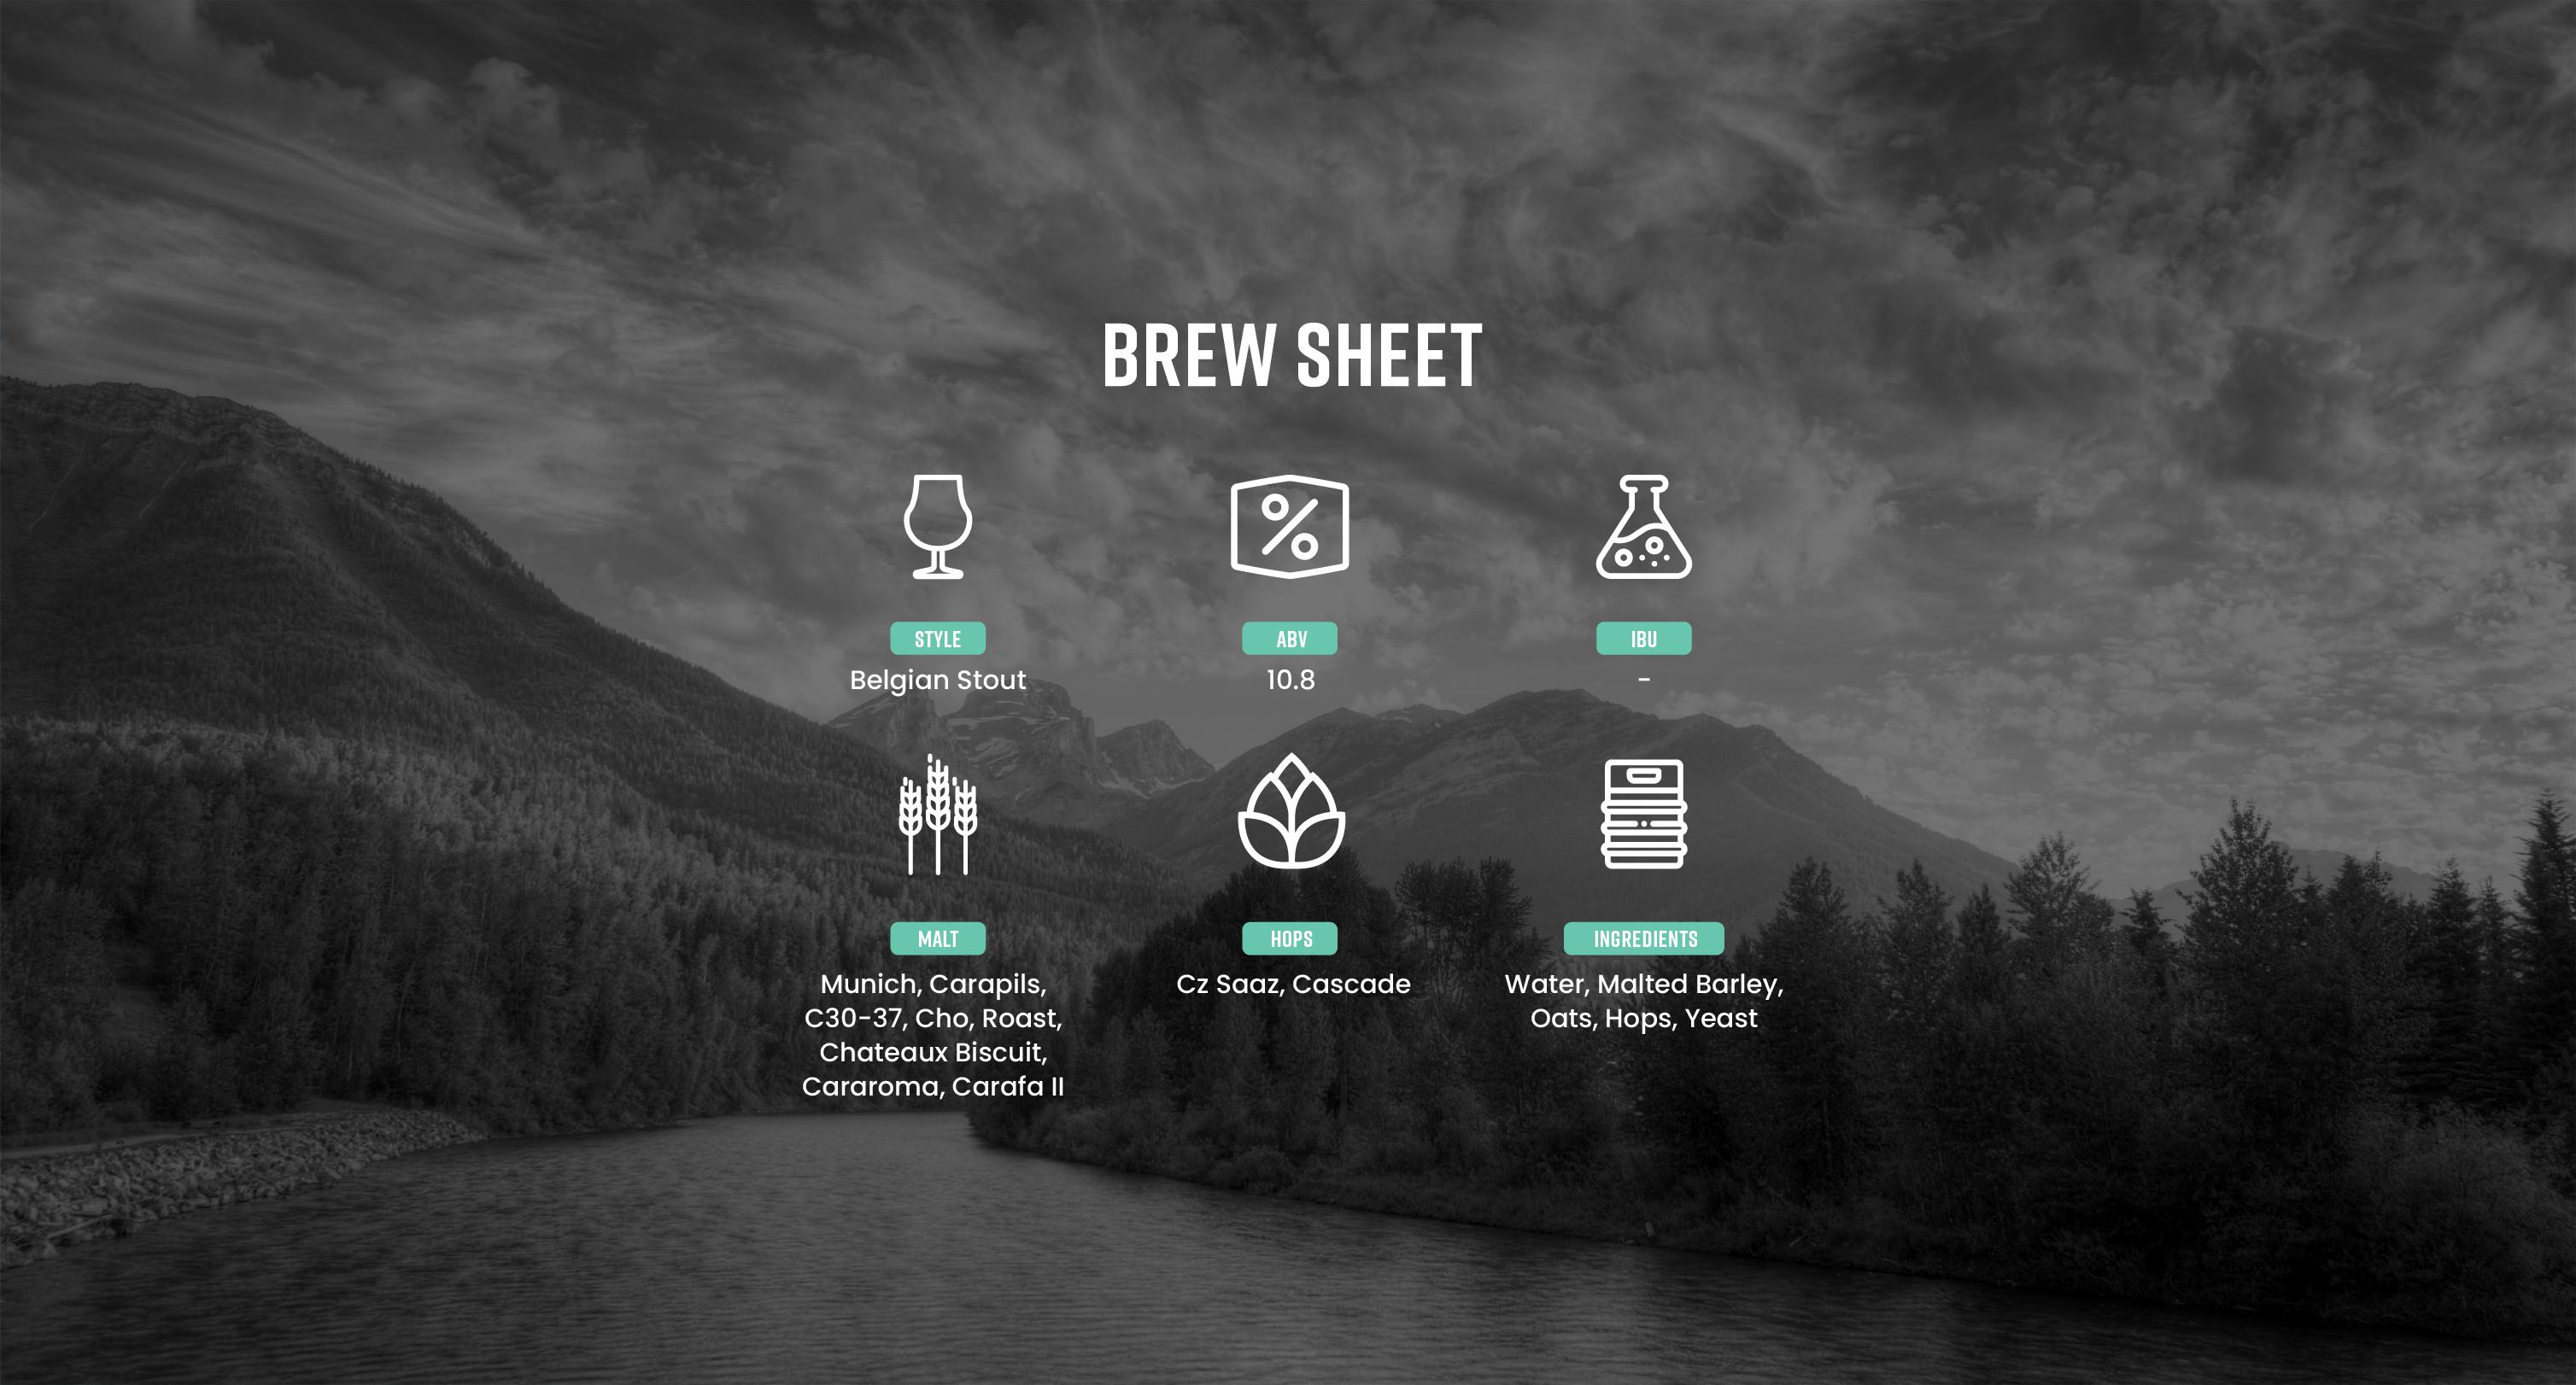 Barrel Aged Stout Brew Sheet